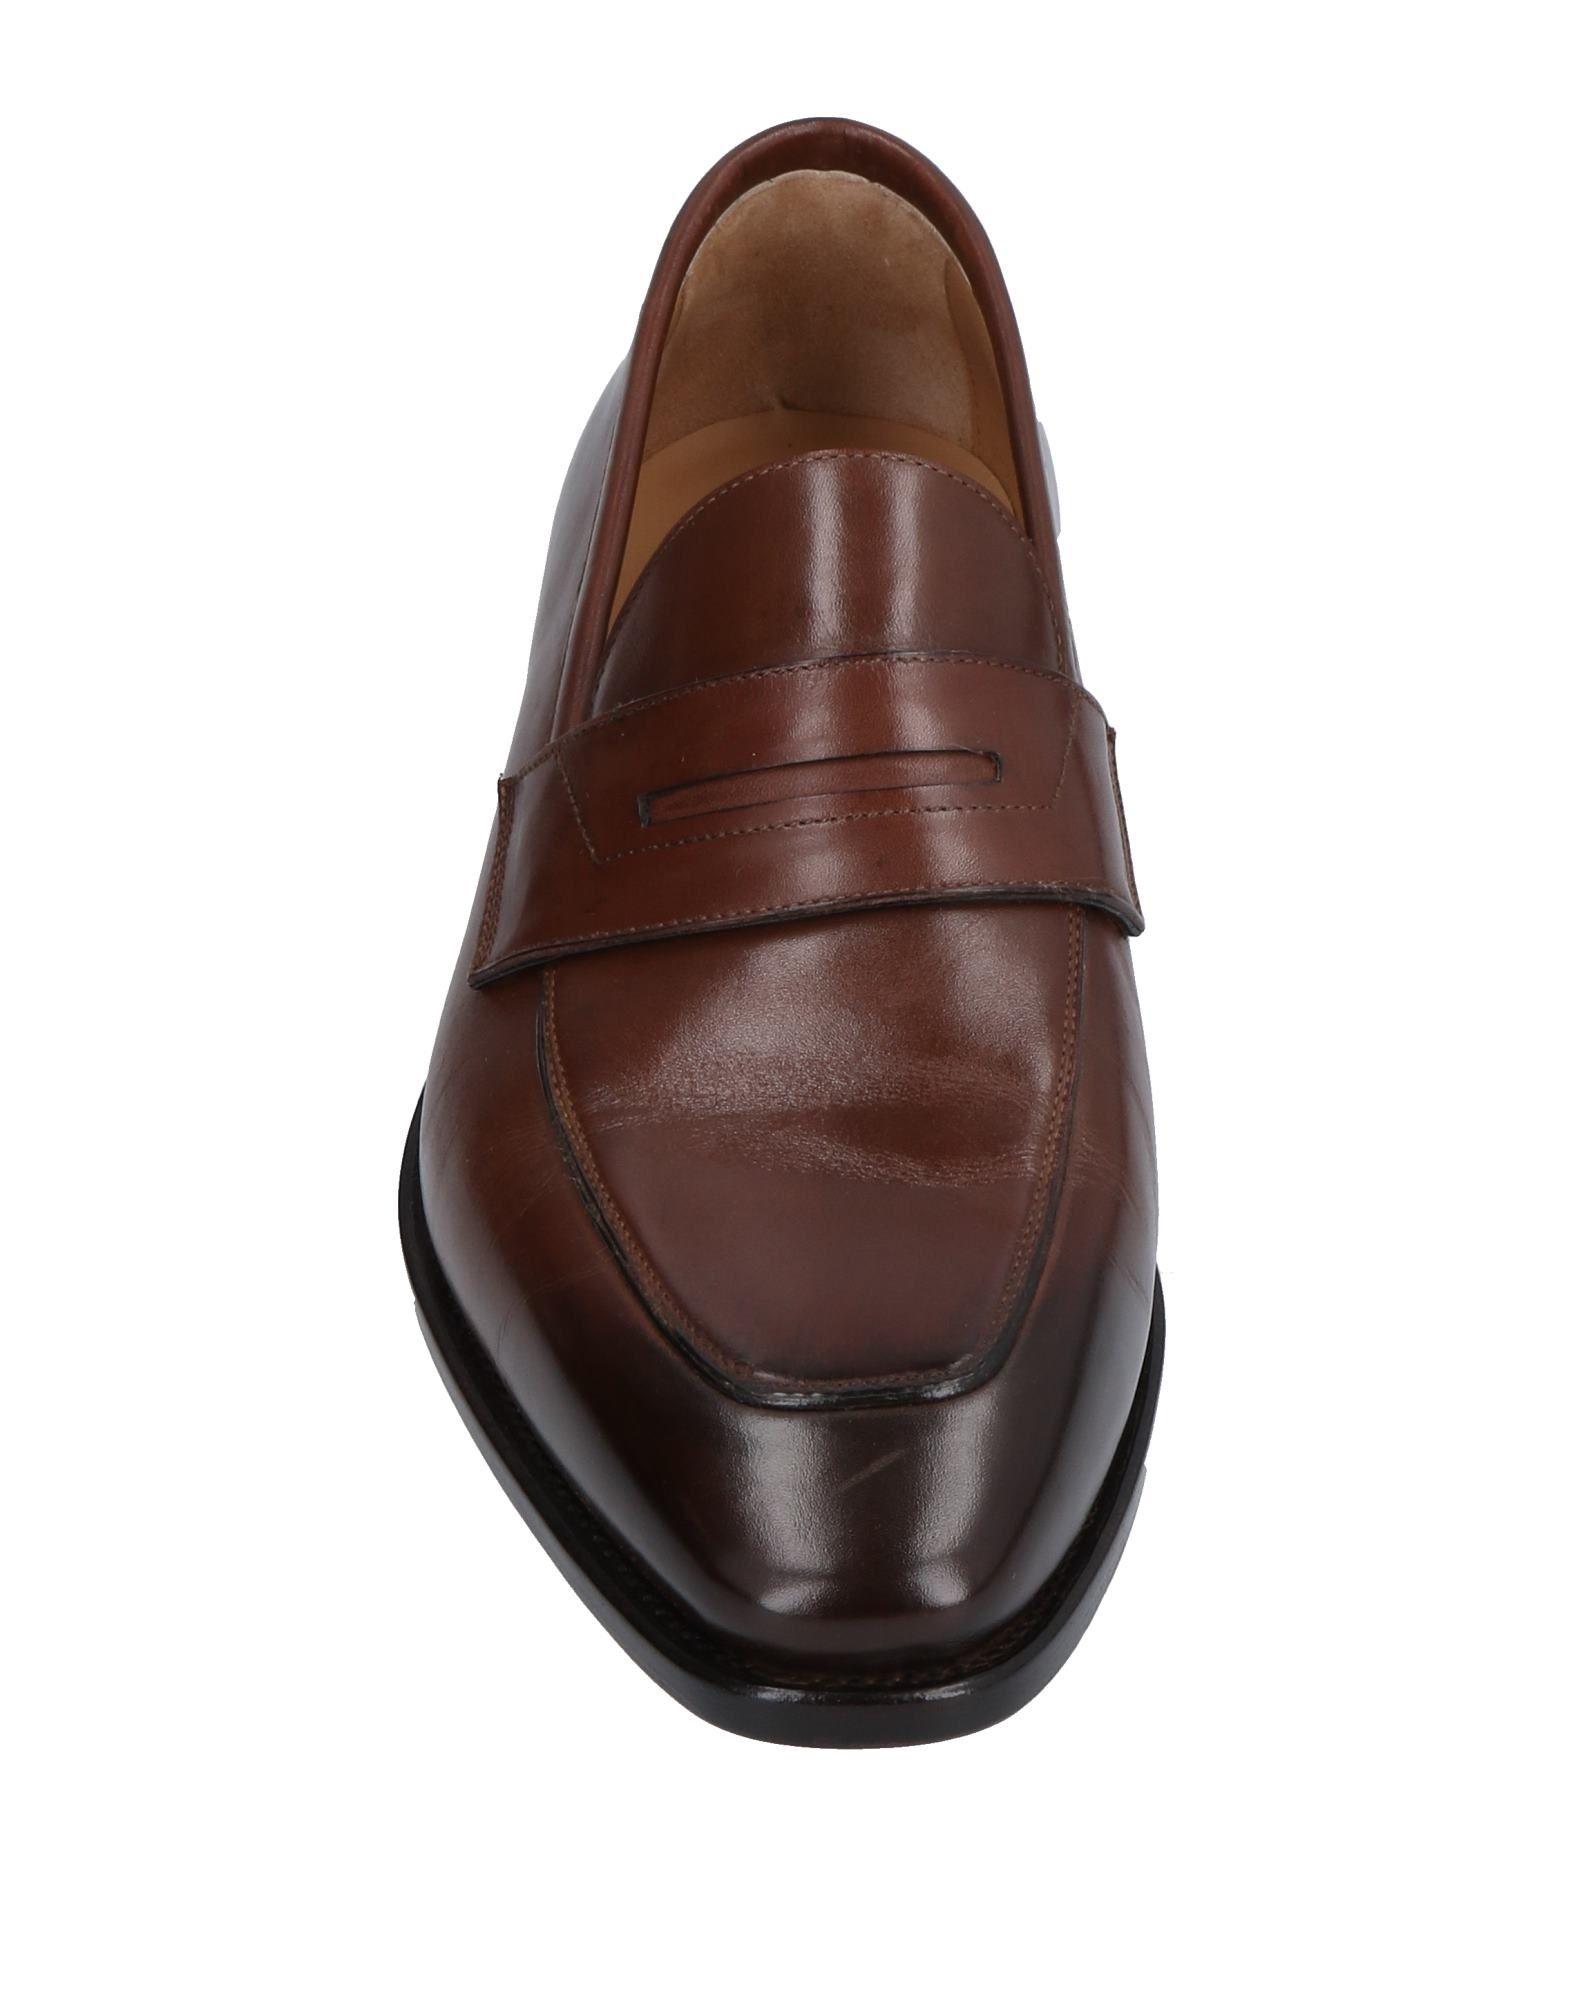 Salvatore Ferragamo Mokassins Herren  Schuhe 11504941SU Gute Qualität beliebte Schuhe  fb759e